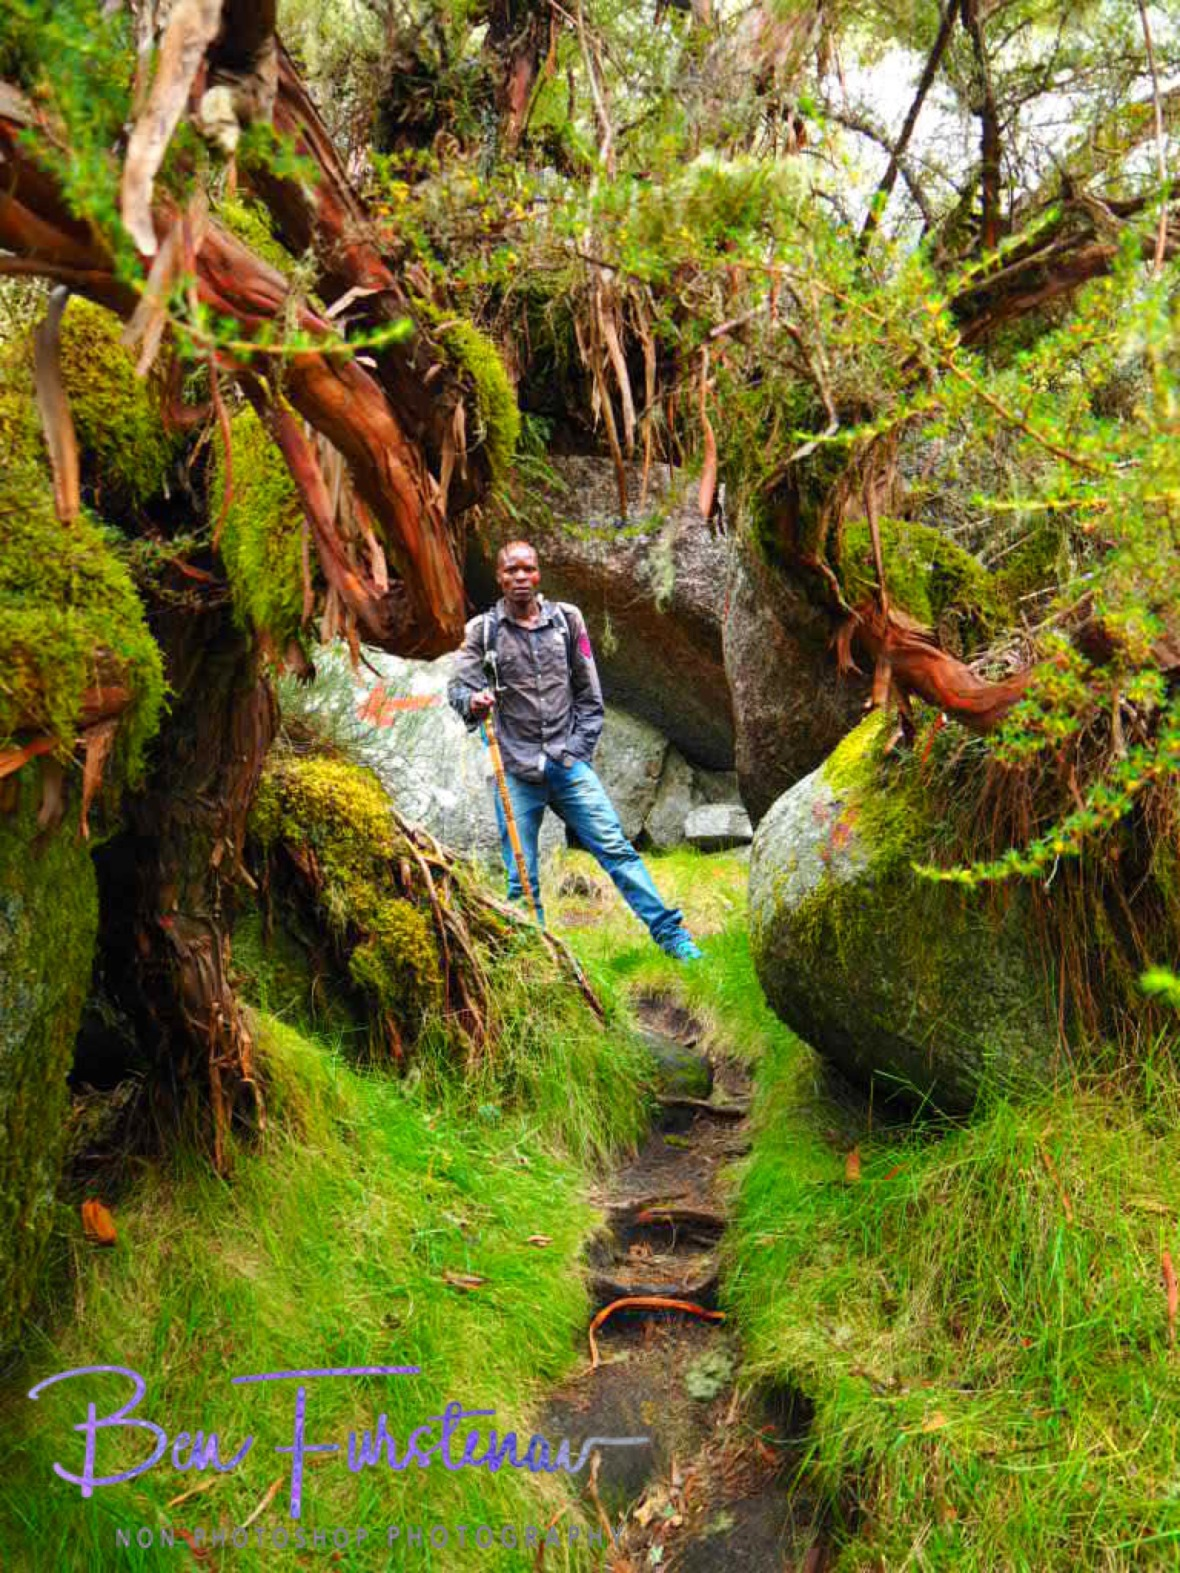 Nenani in lush green alpine tropics, Mulanje Mountains, Malawi